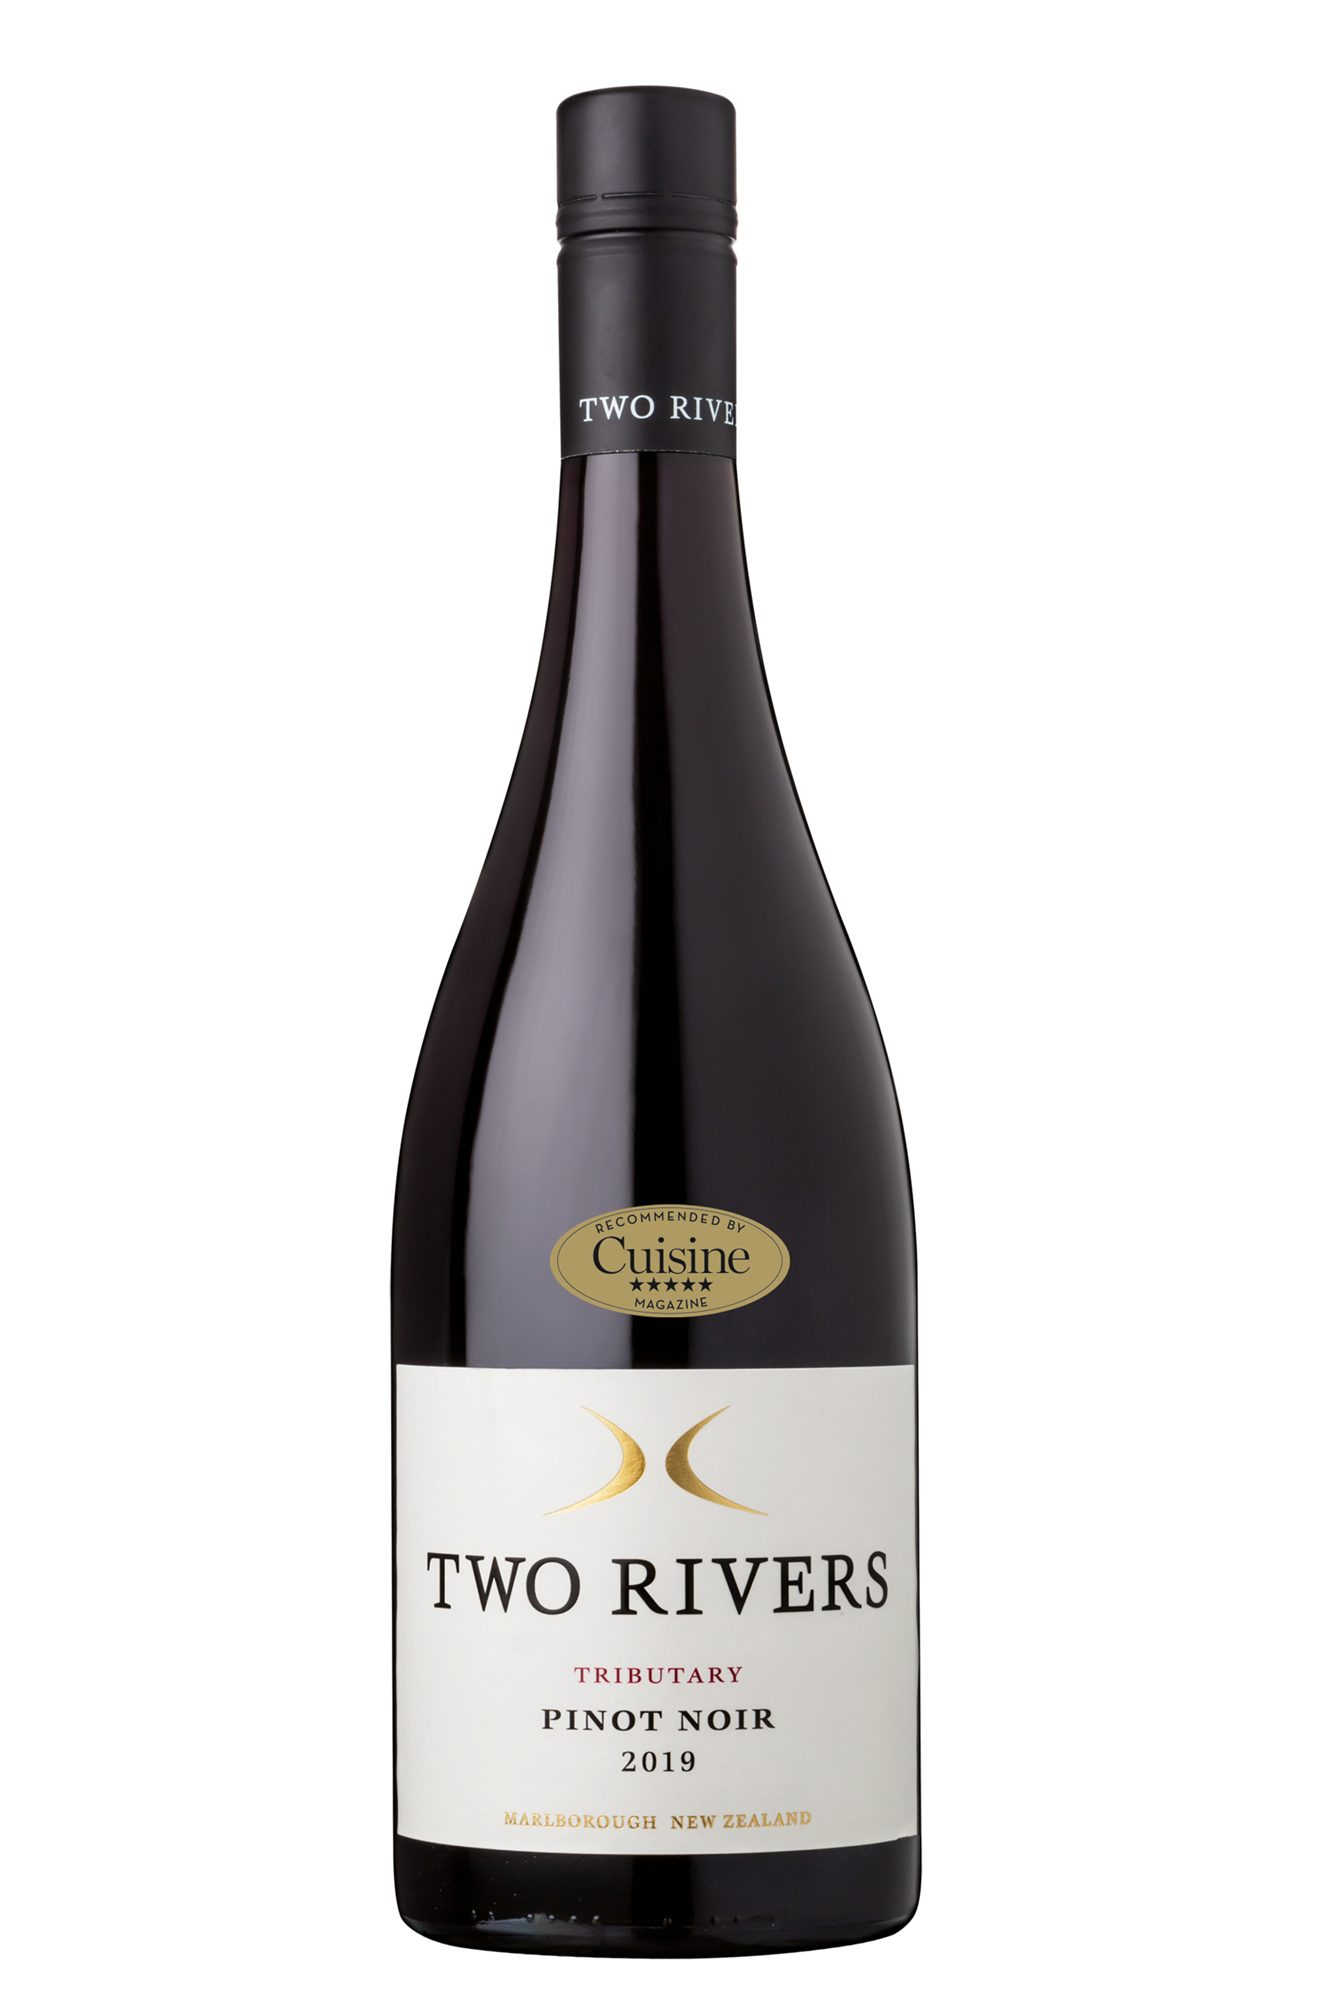 Two Rivers Tributary Pinot Noir 2019 (Marlborough)